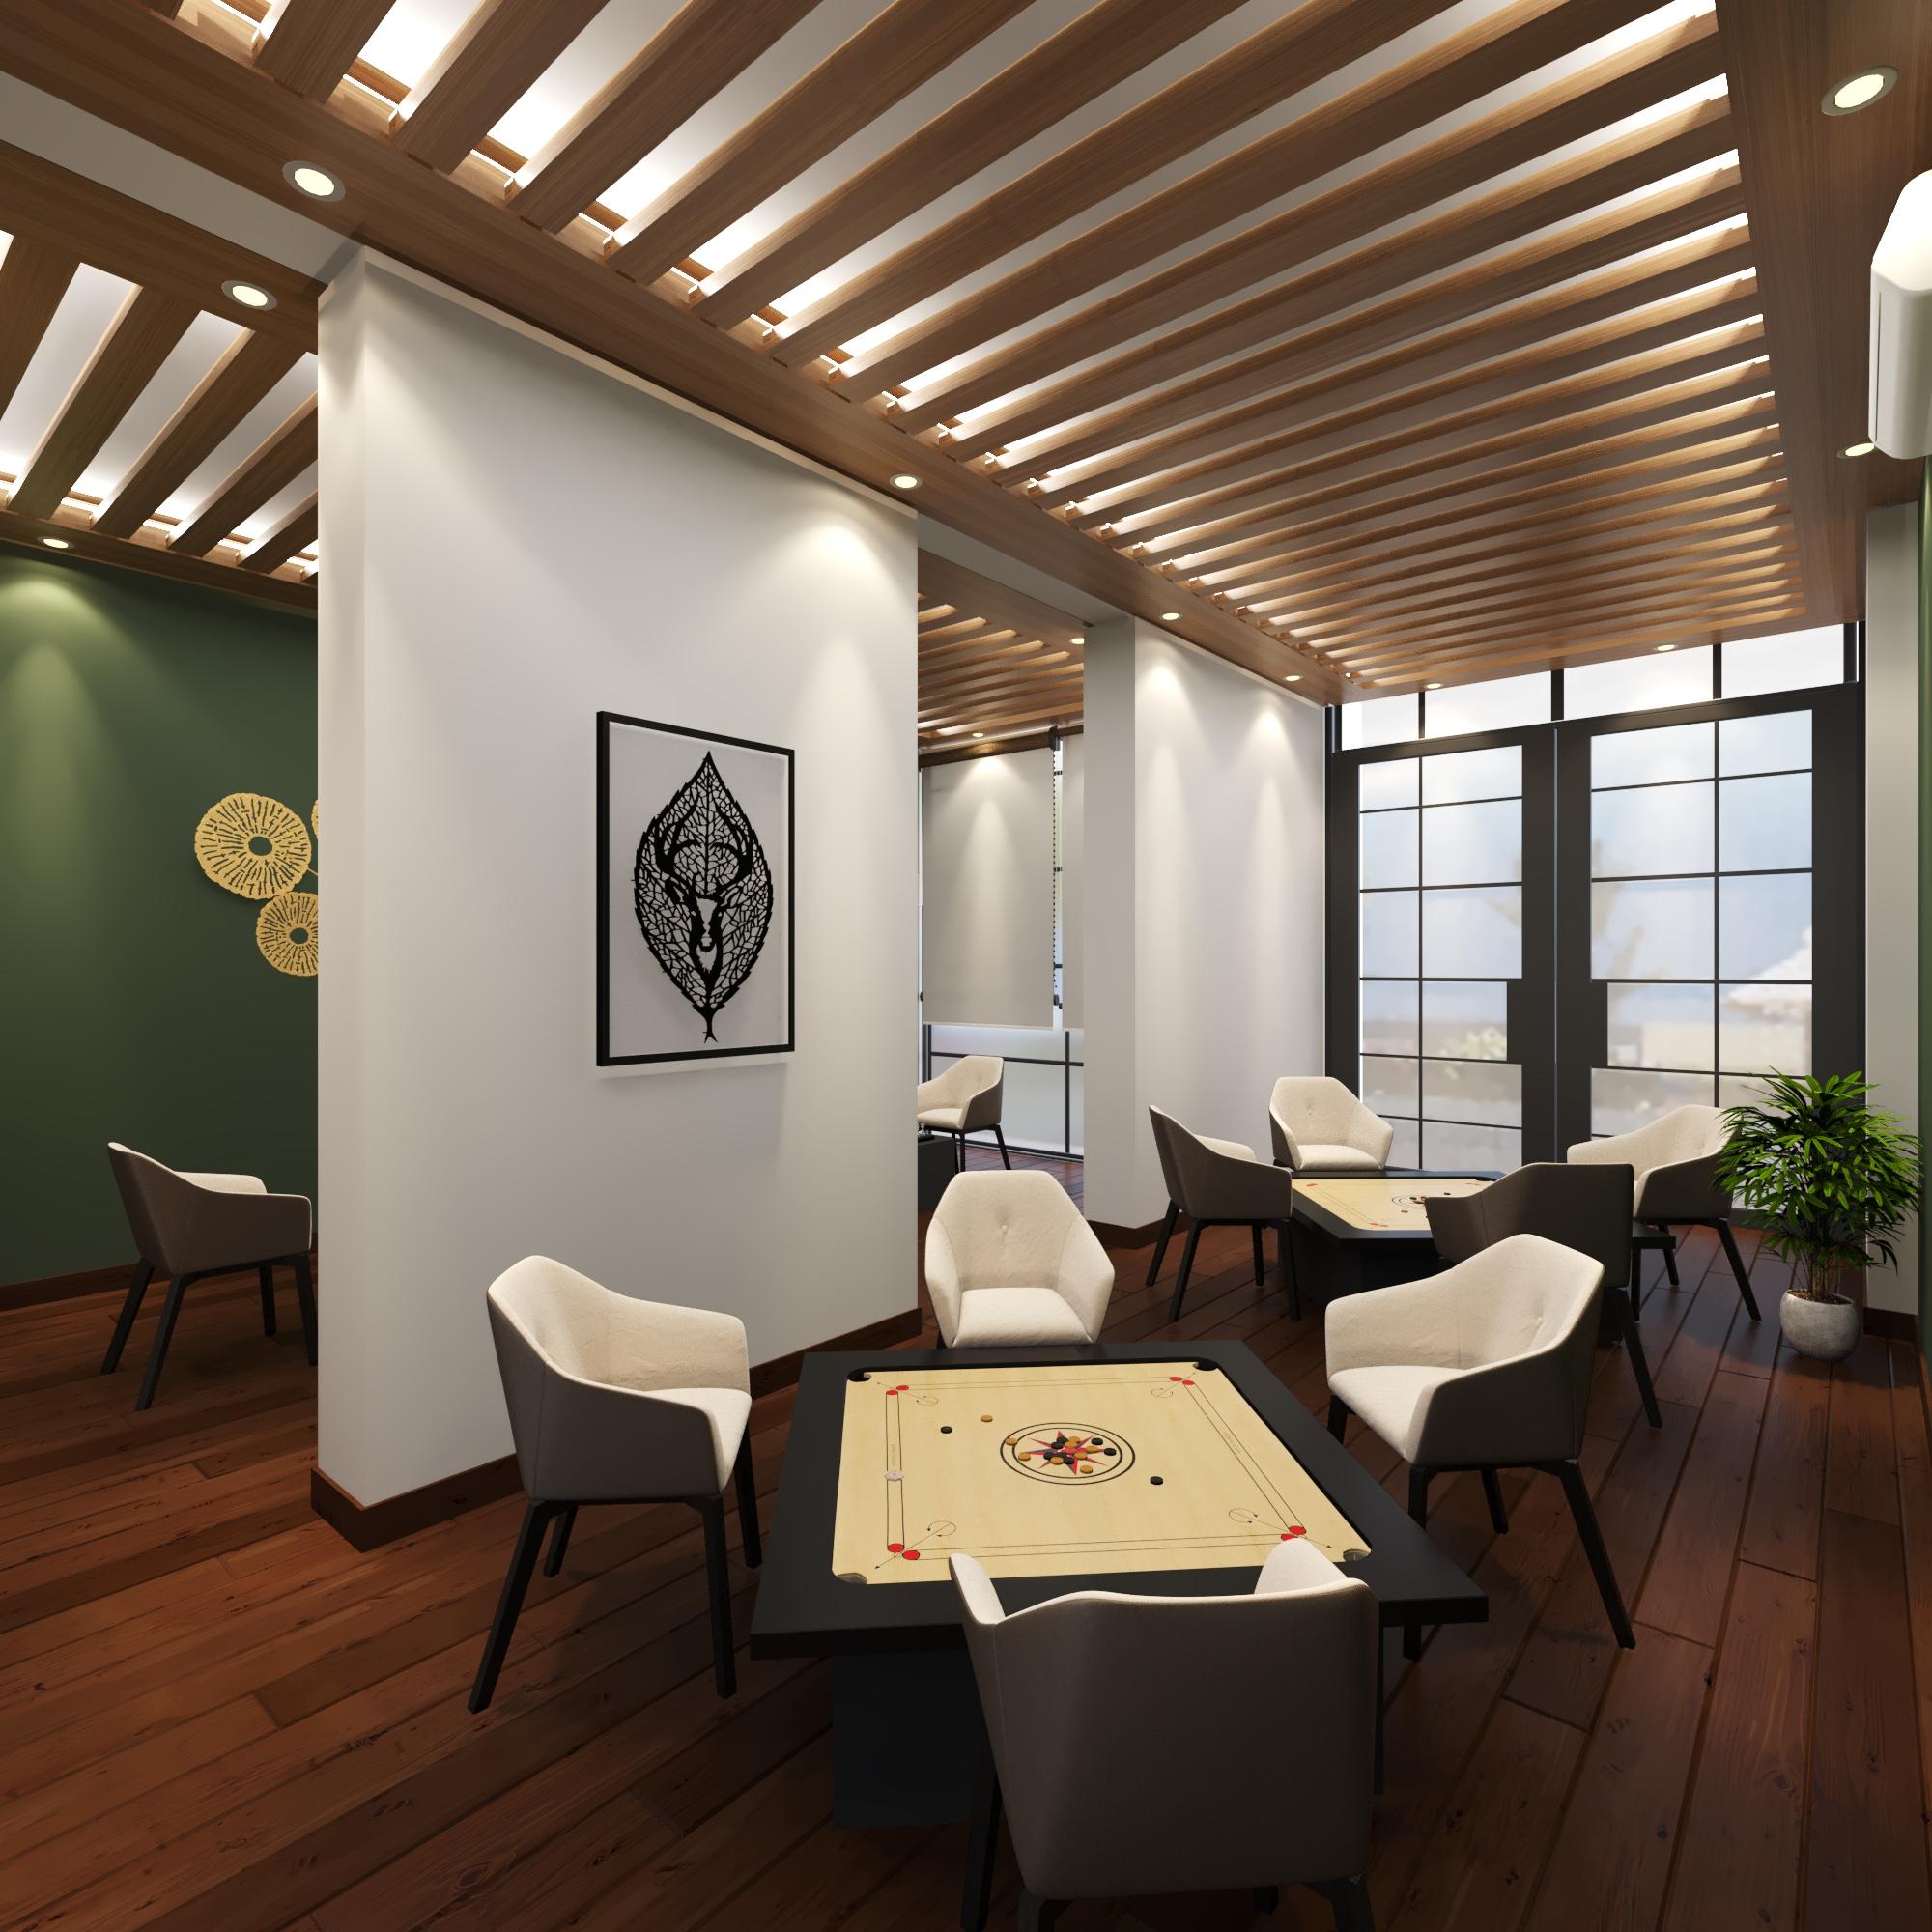 satyam oasis amenities features6